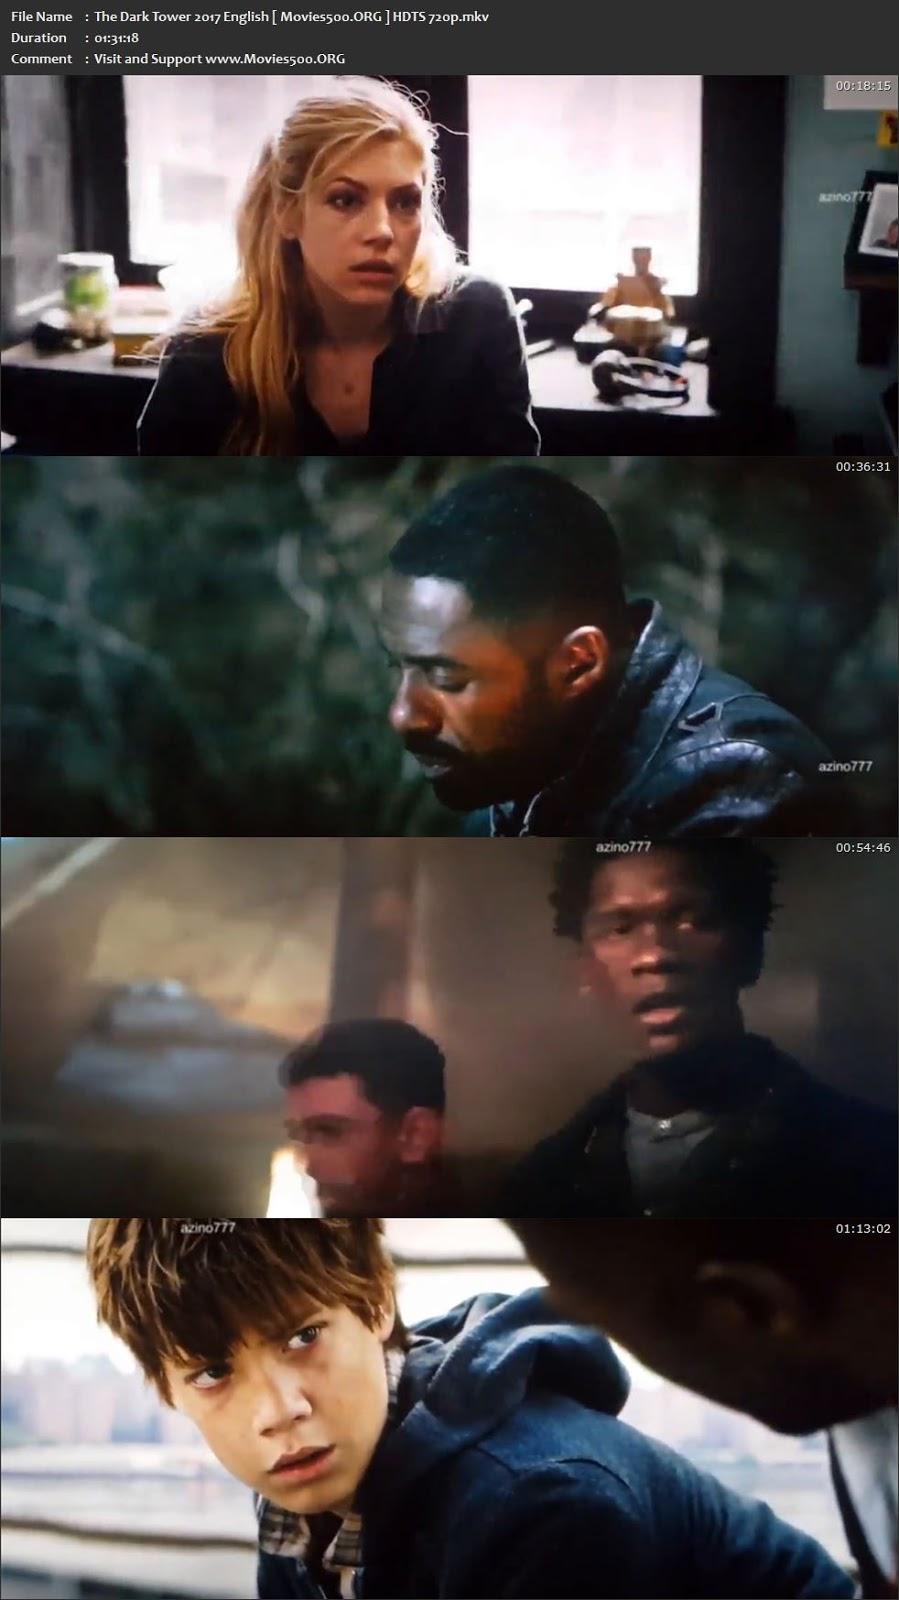 Dark Tower 2017 English Full Movie HDTS 720p at movies500.site